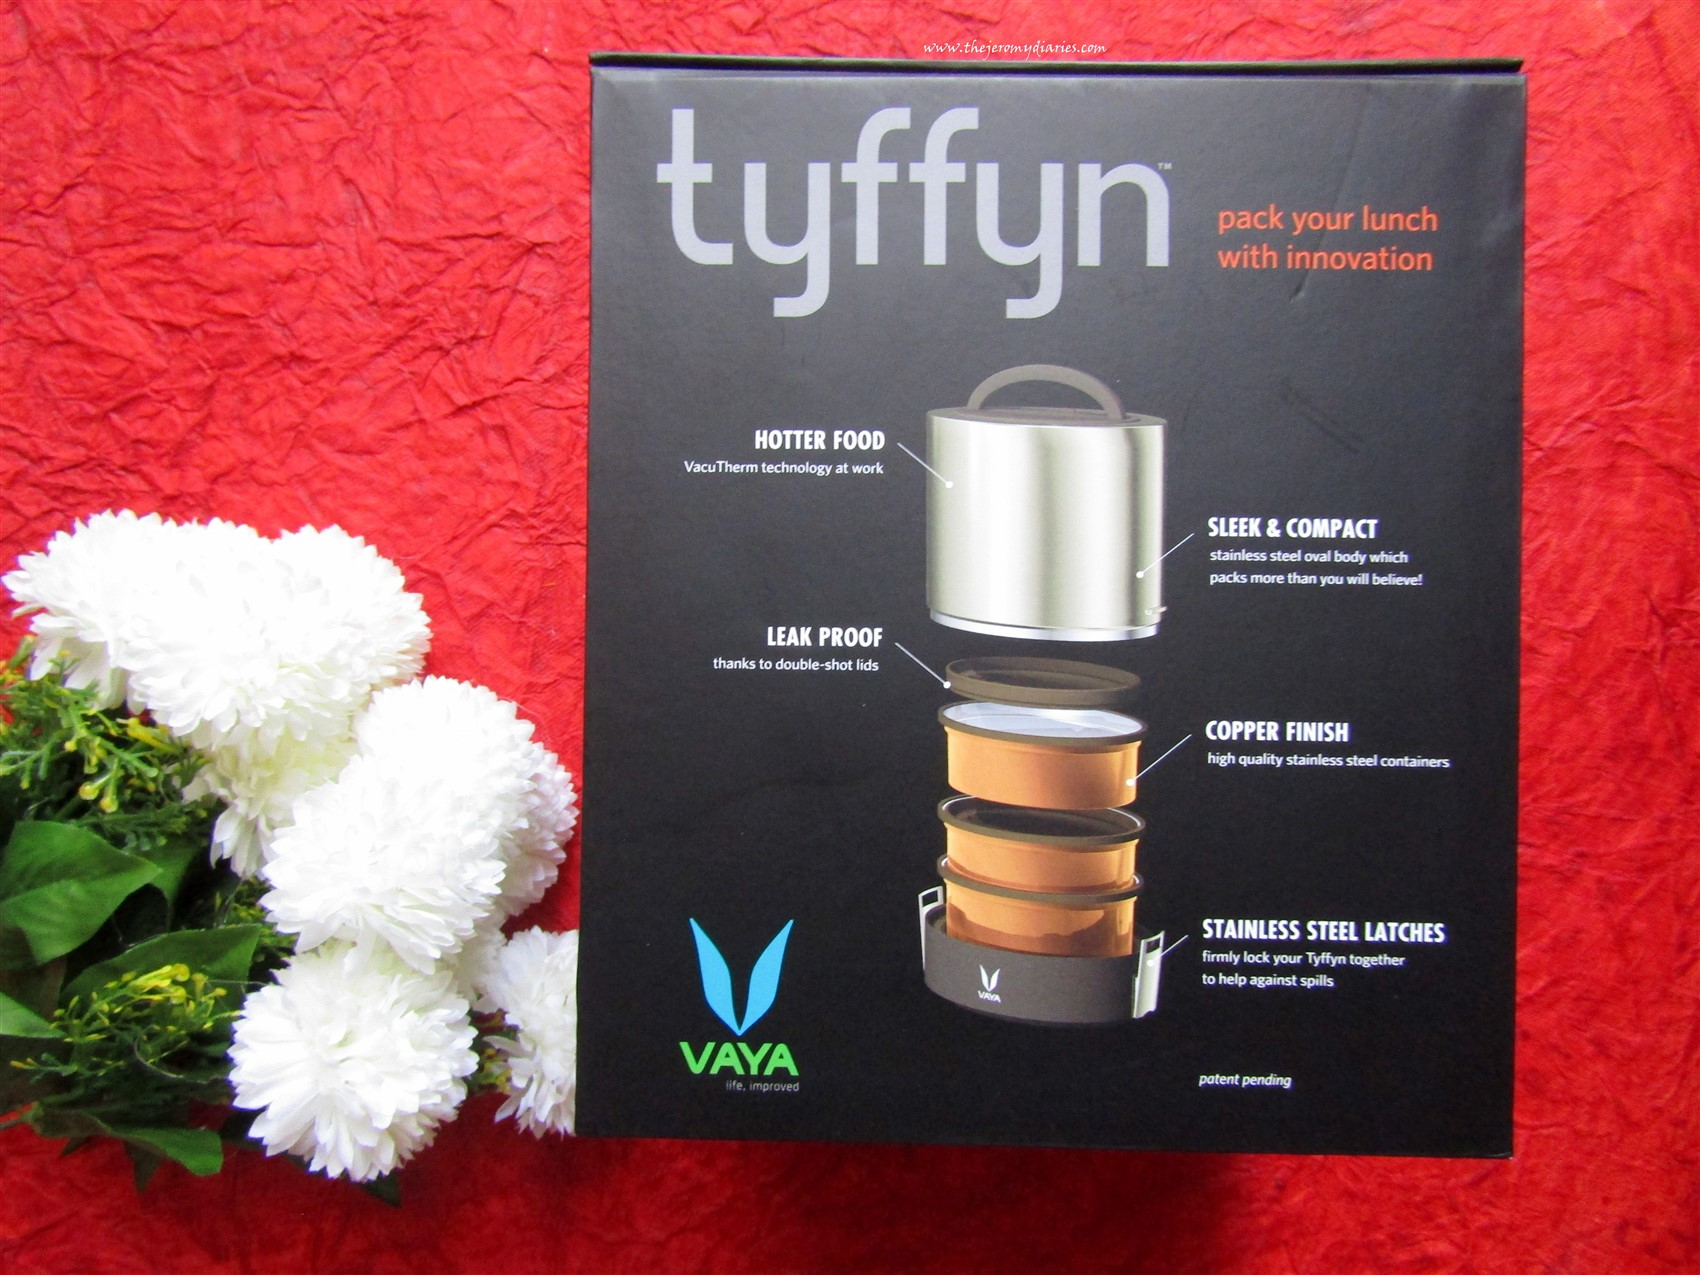 vaya-tyffyn-bangalore-launch-the-jeromy-diaries